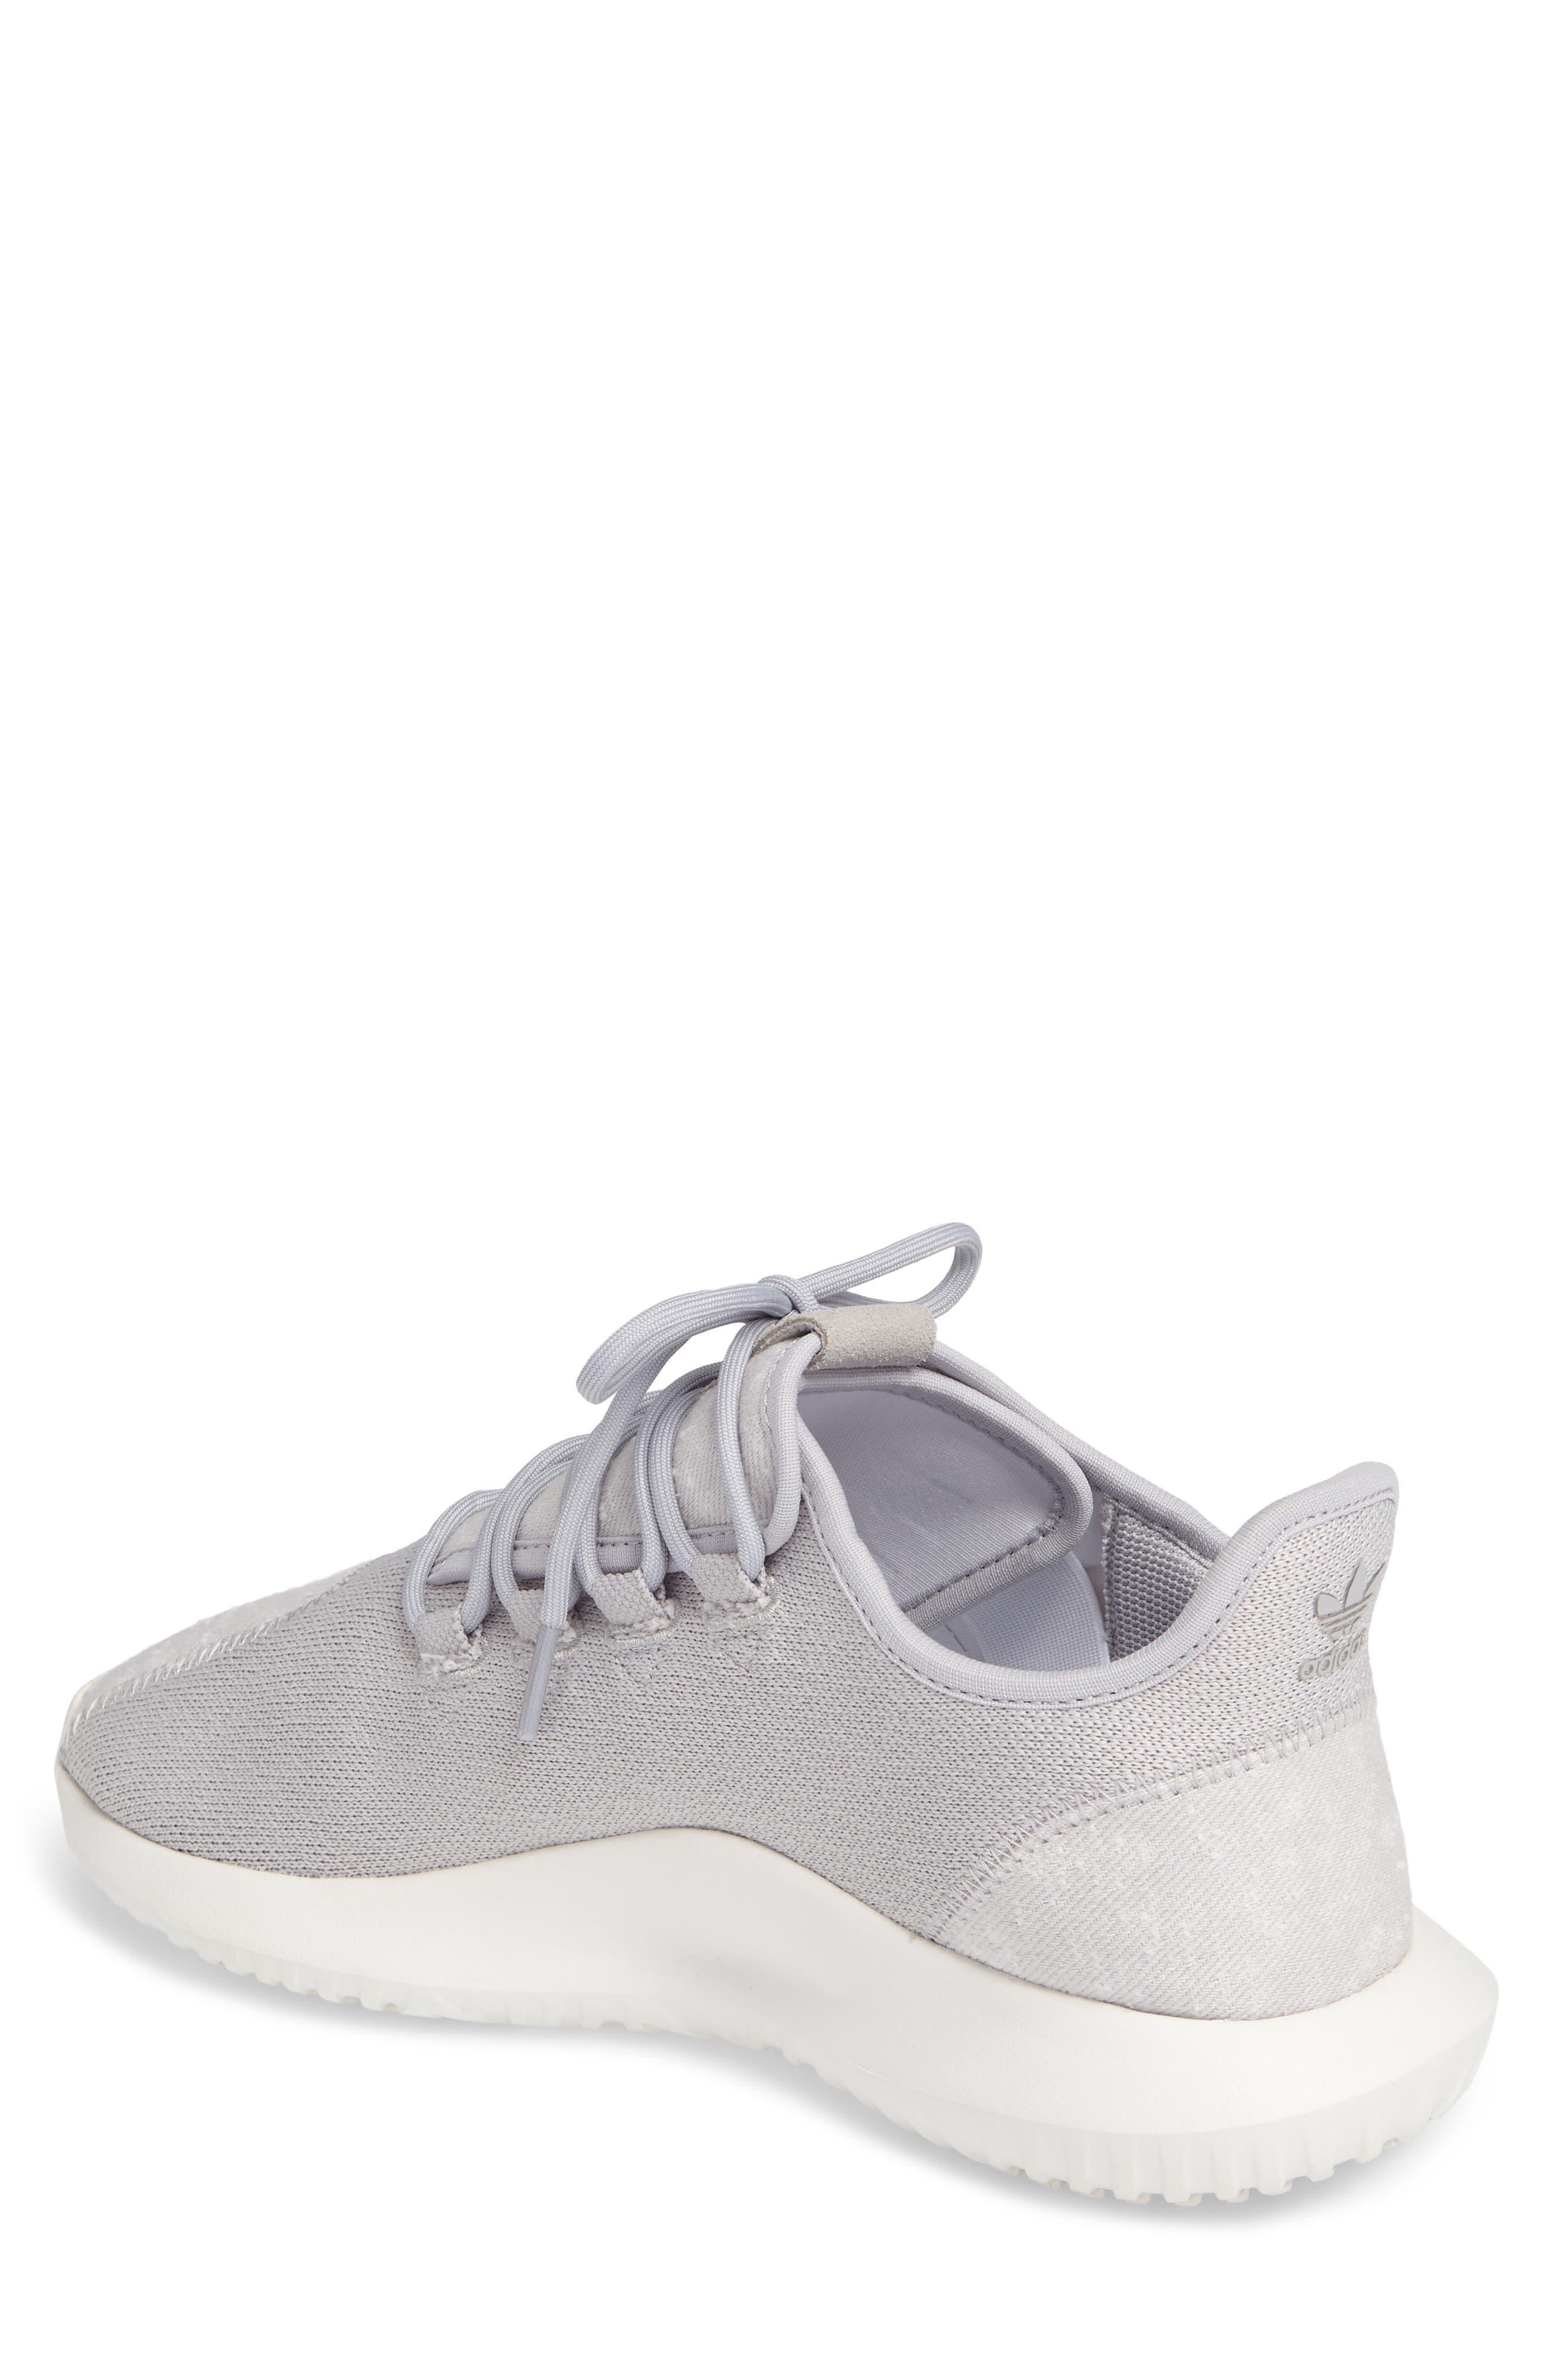 Tubular Shadow Sneaker,                             Alternate thumbnail 9, color,